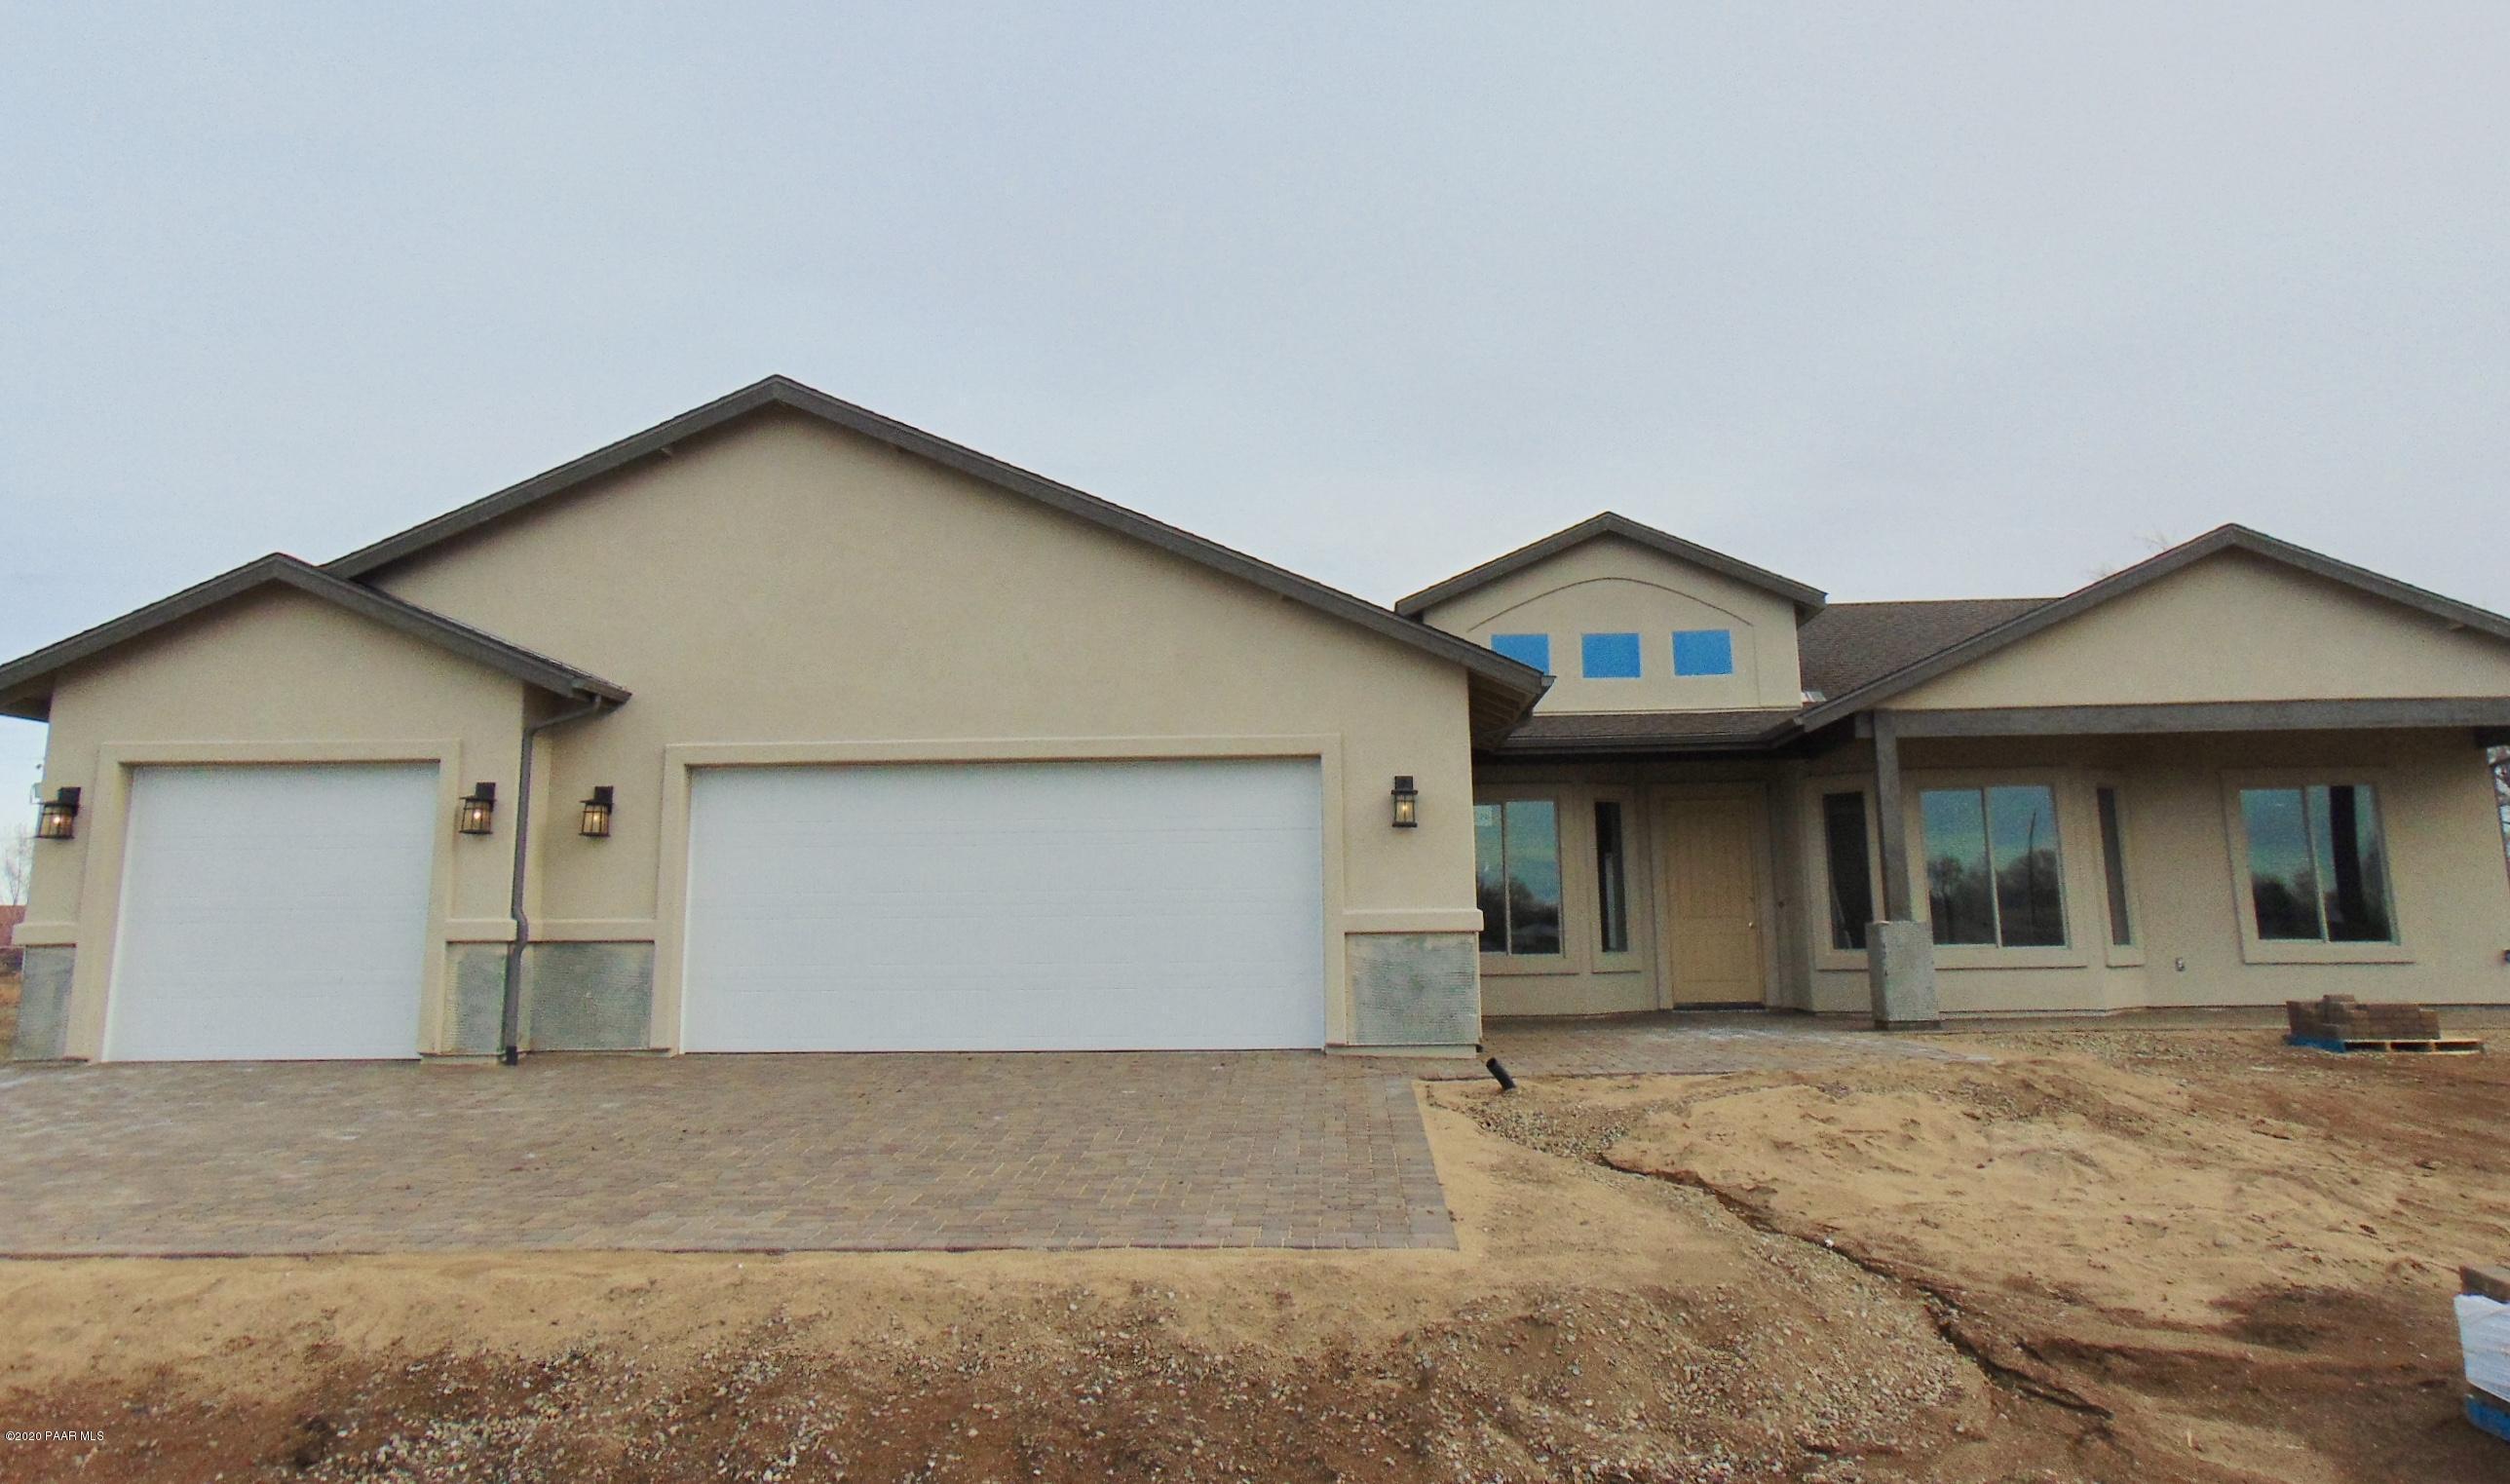 Photo of 81 Smith, Chino Valley, AZ 86323